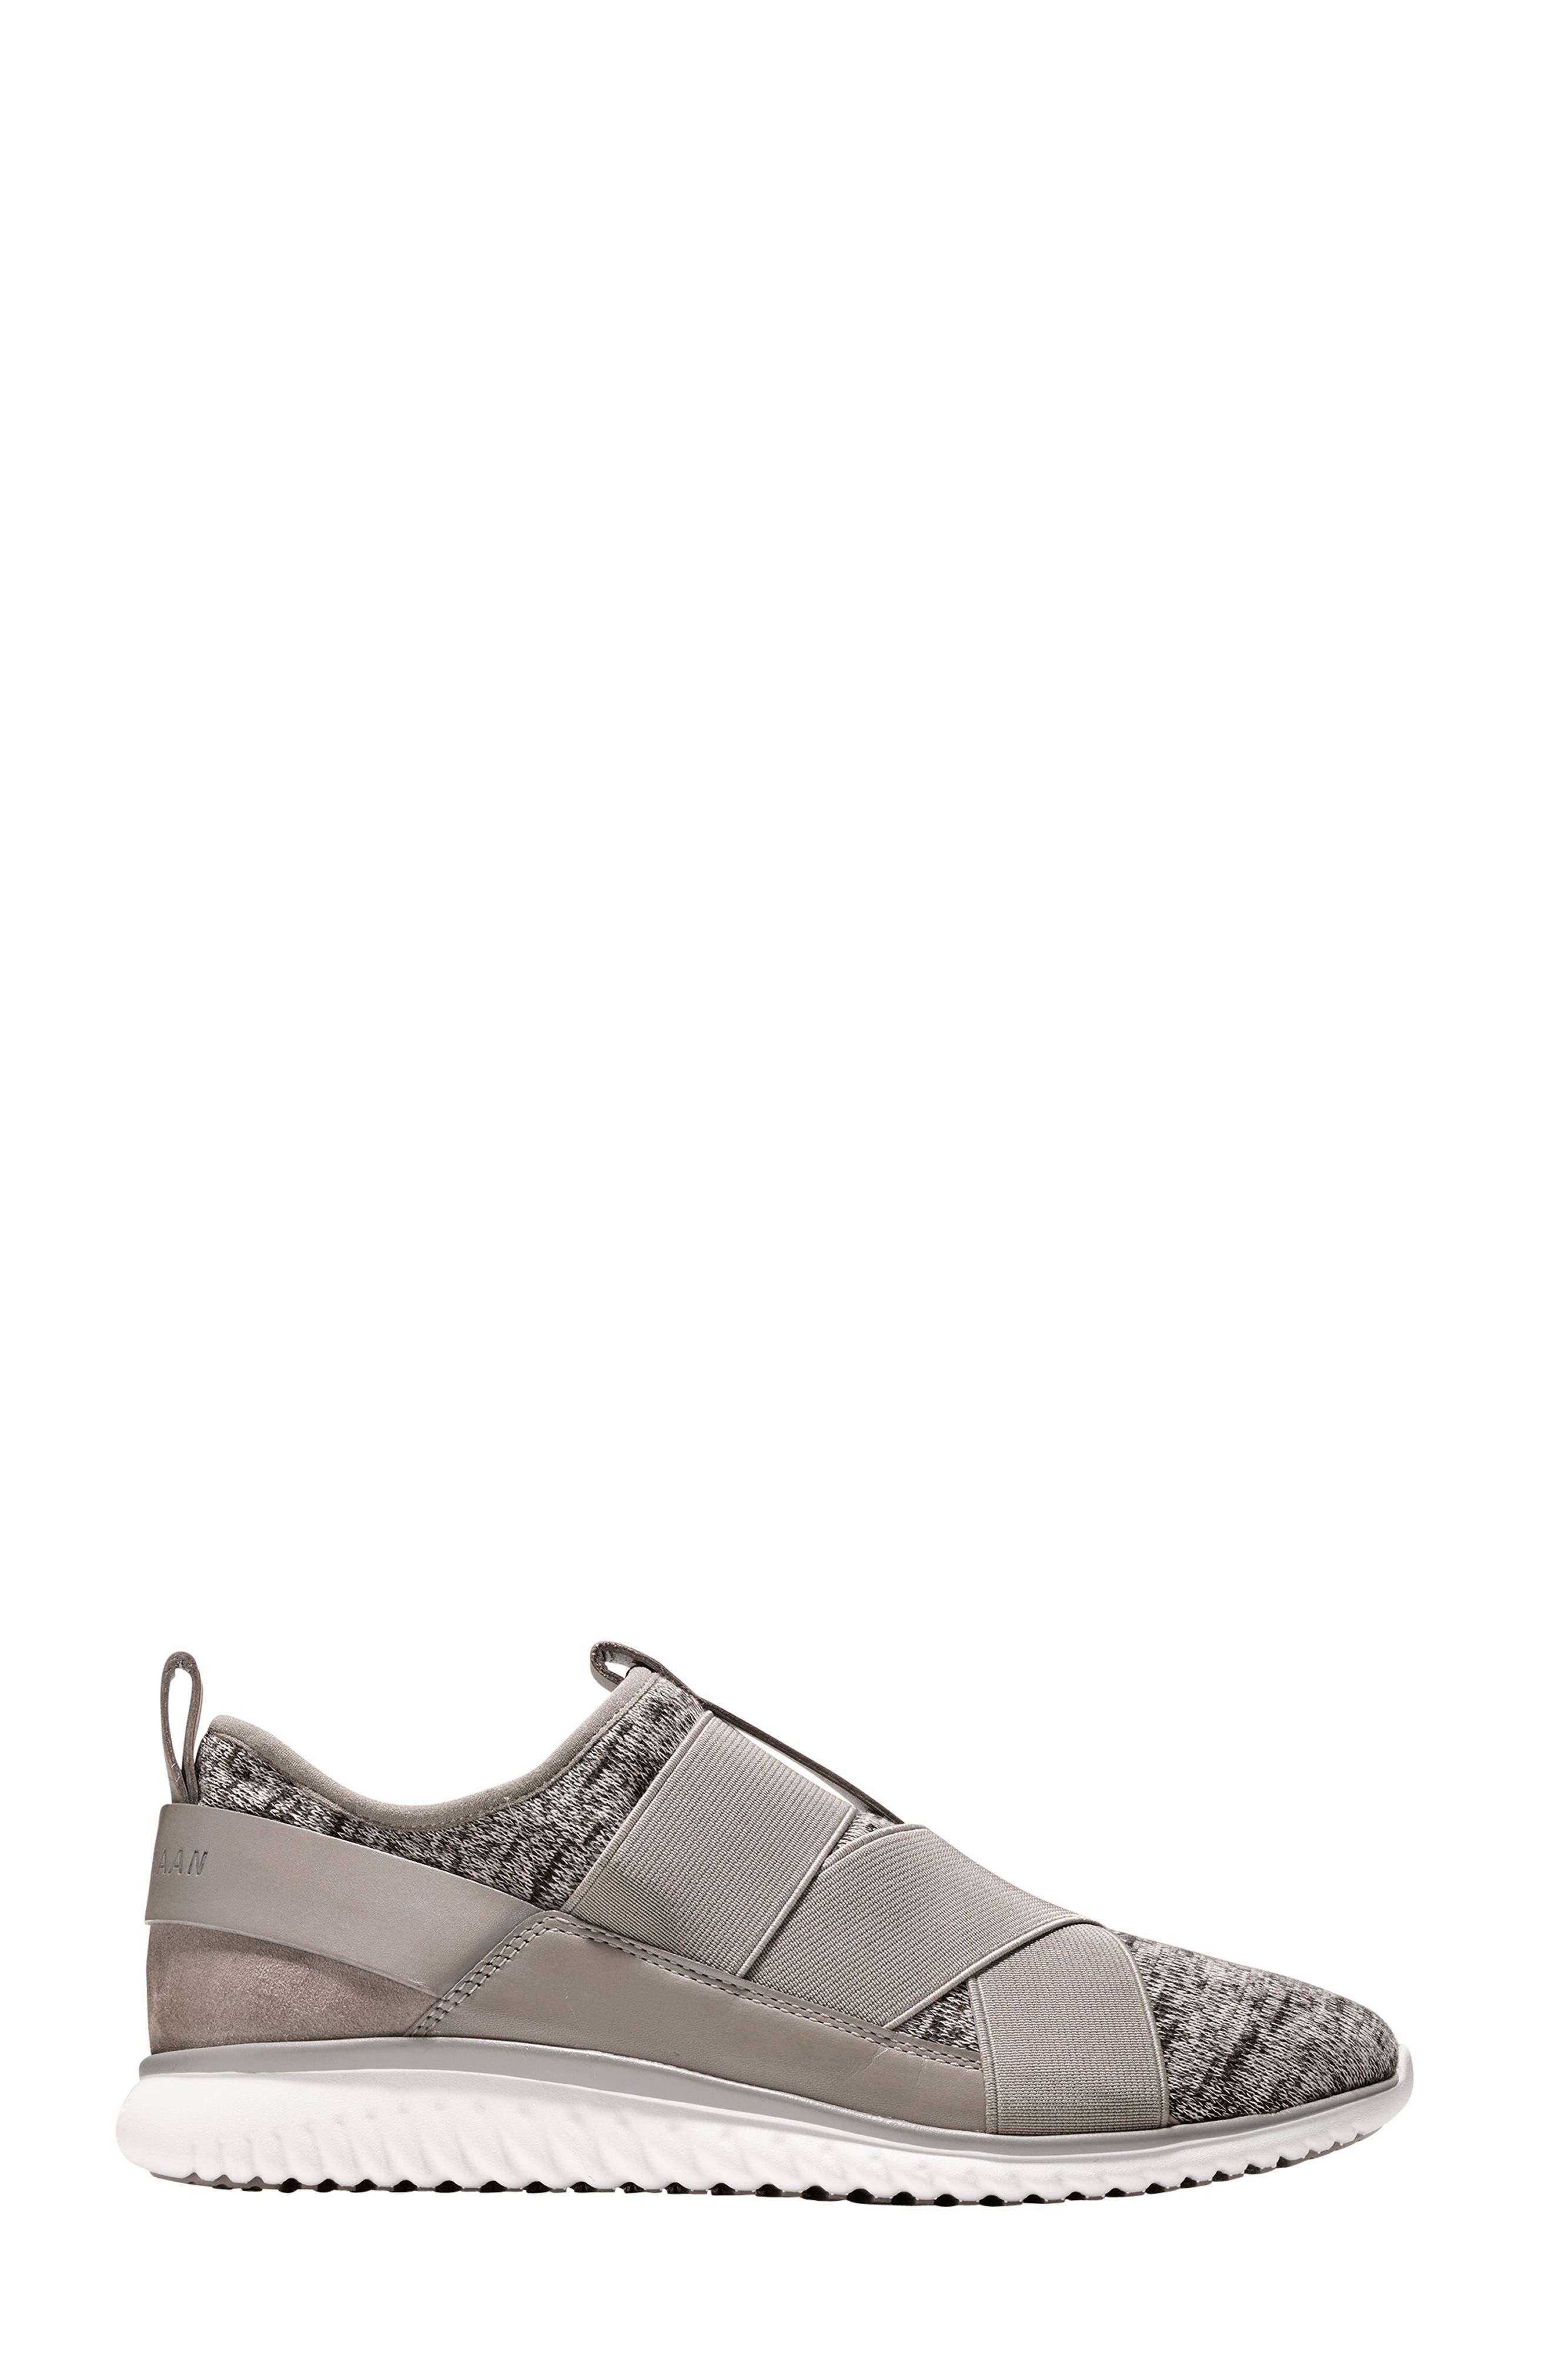 'StudioGrand' Sneaker,                             Alternate thumbnail 3, color,                             Rockridge/ Pumice Stone Fabric